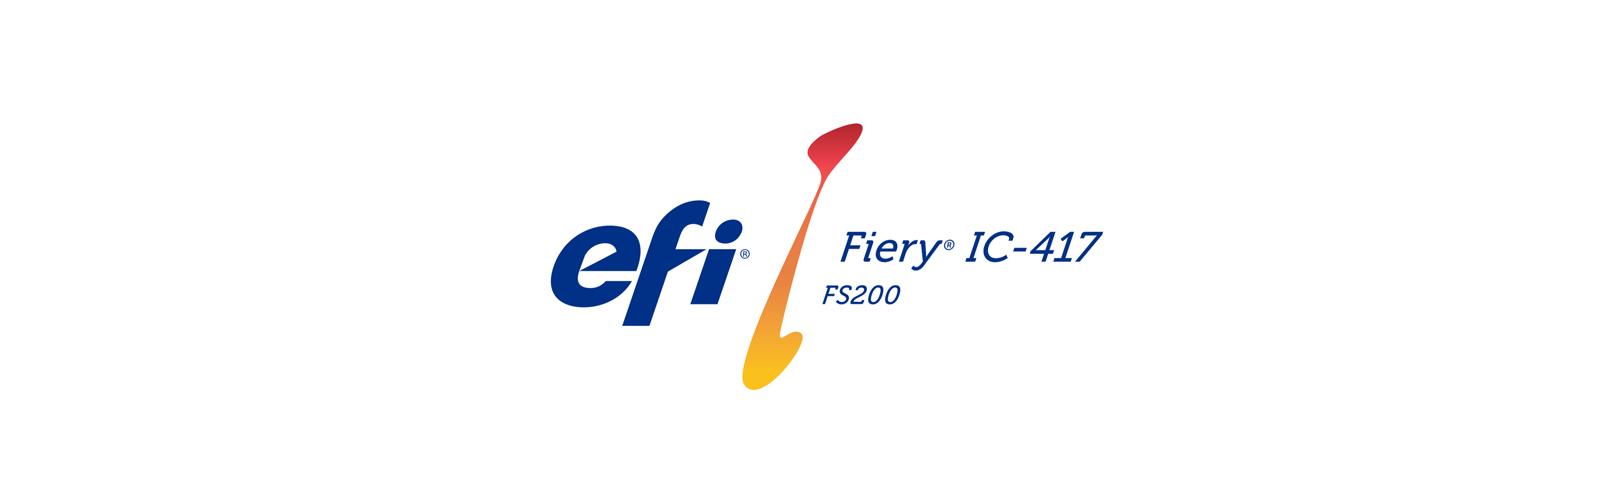 EFI-Fiery-IC-417